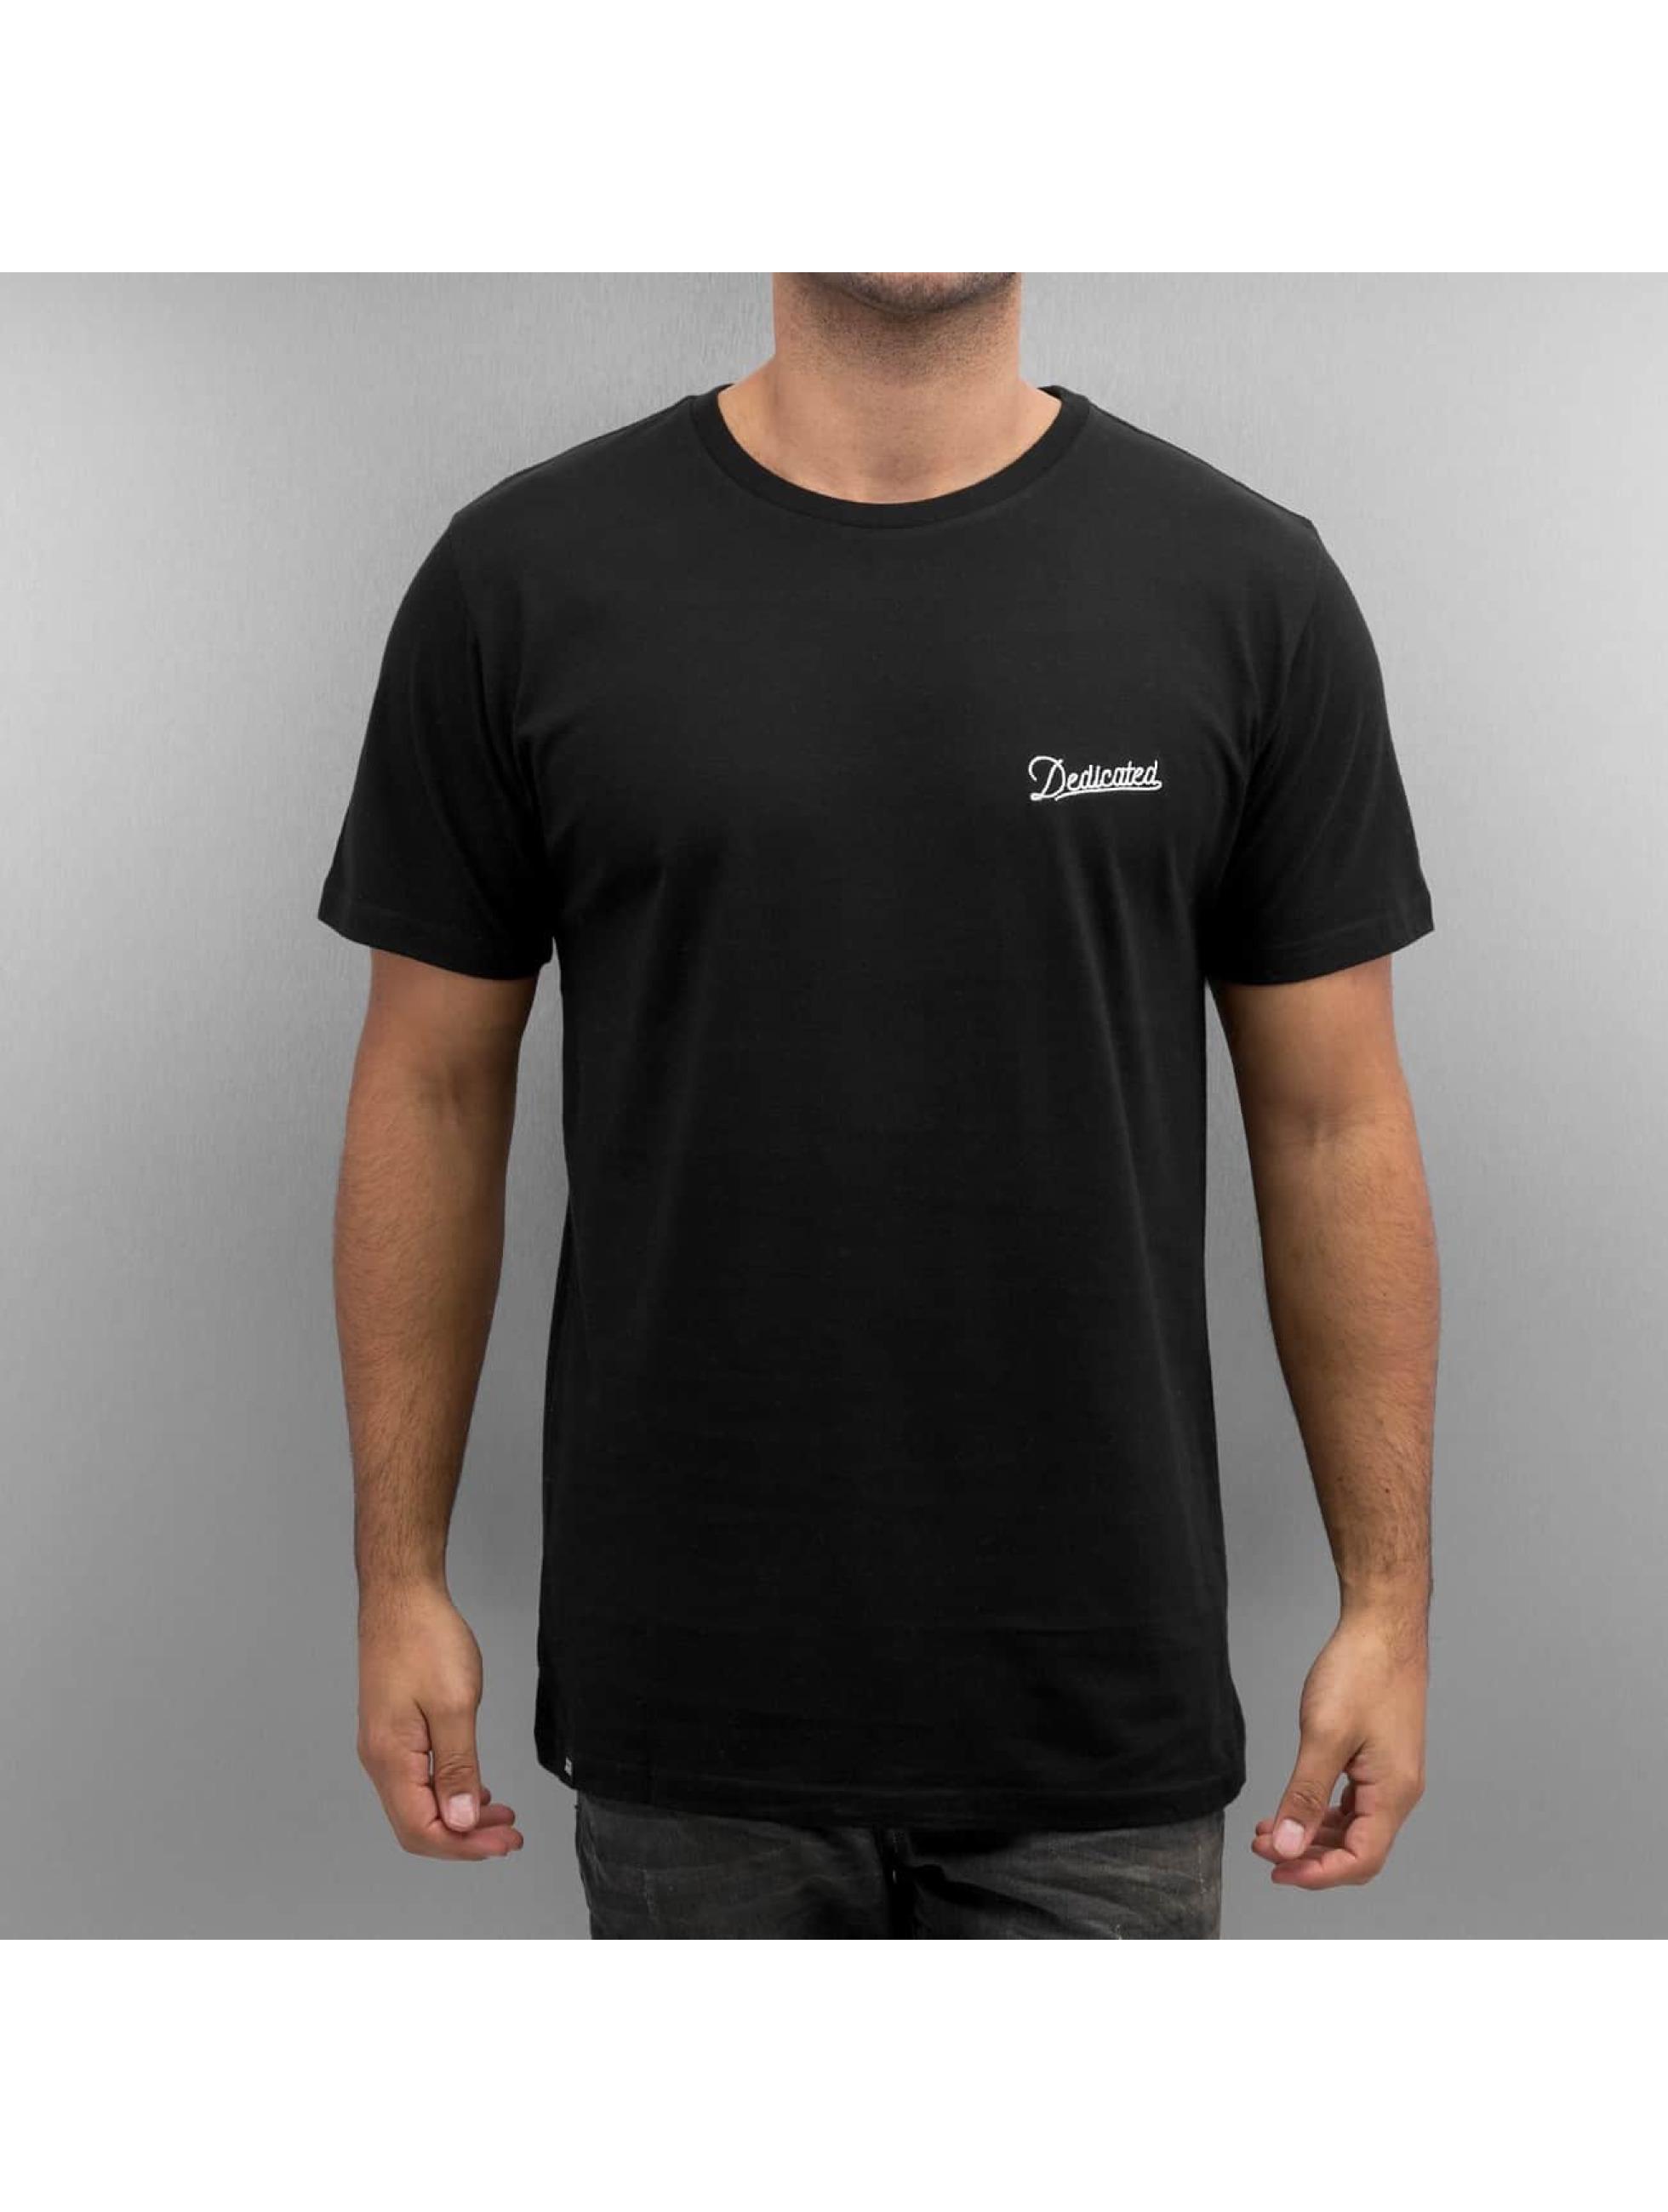 DEDICATED T-Shirt Stockholm Mountain Script schwarz